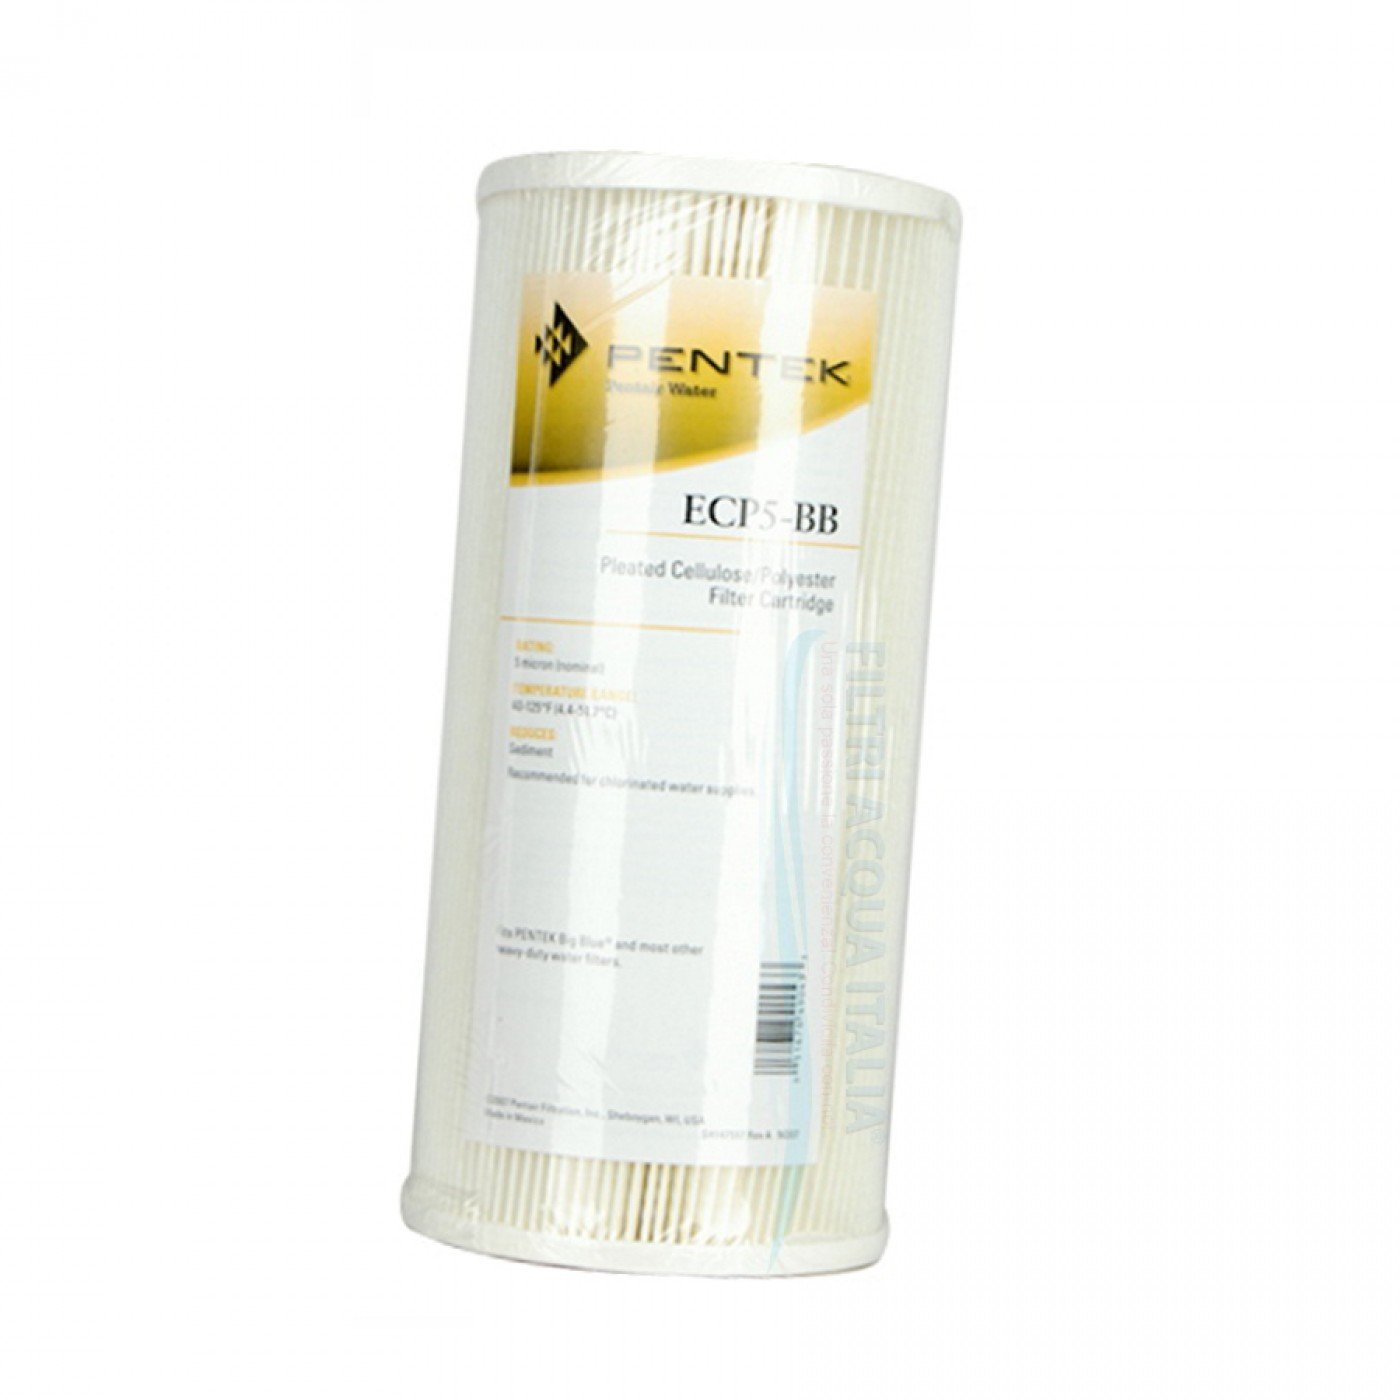 CARTUCCIA PENTEK ECP5-BB 10 Pollici Micron 5